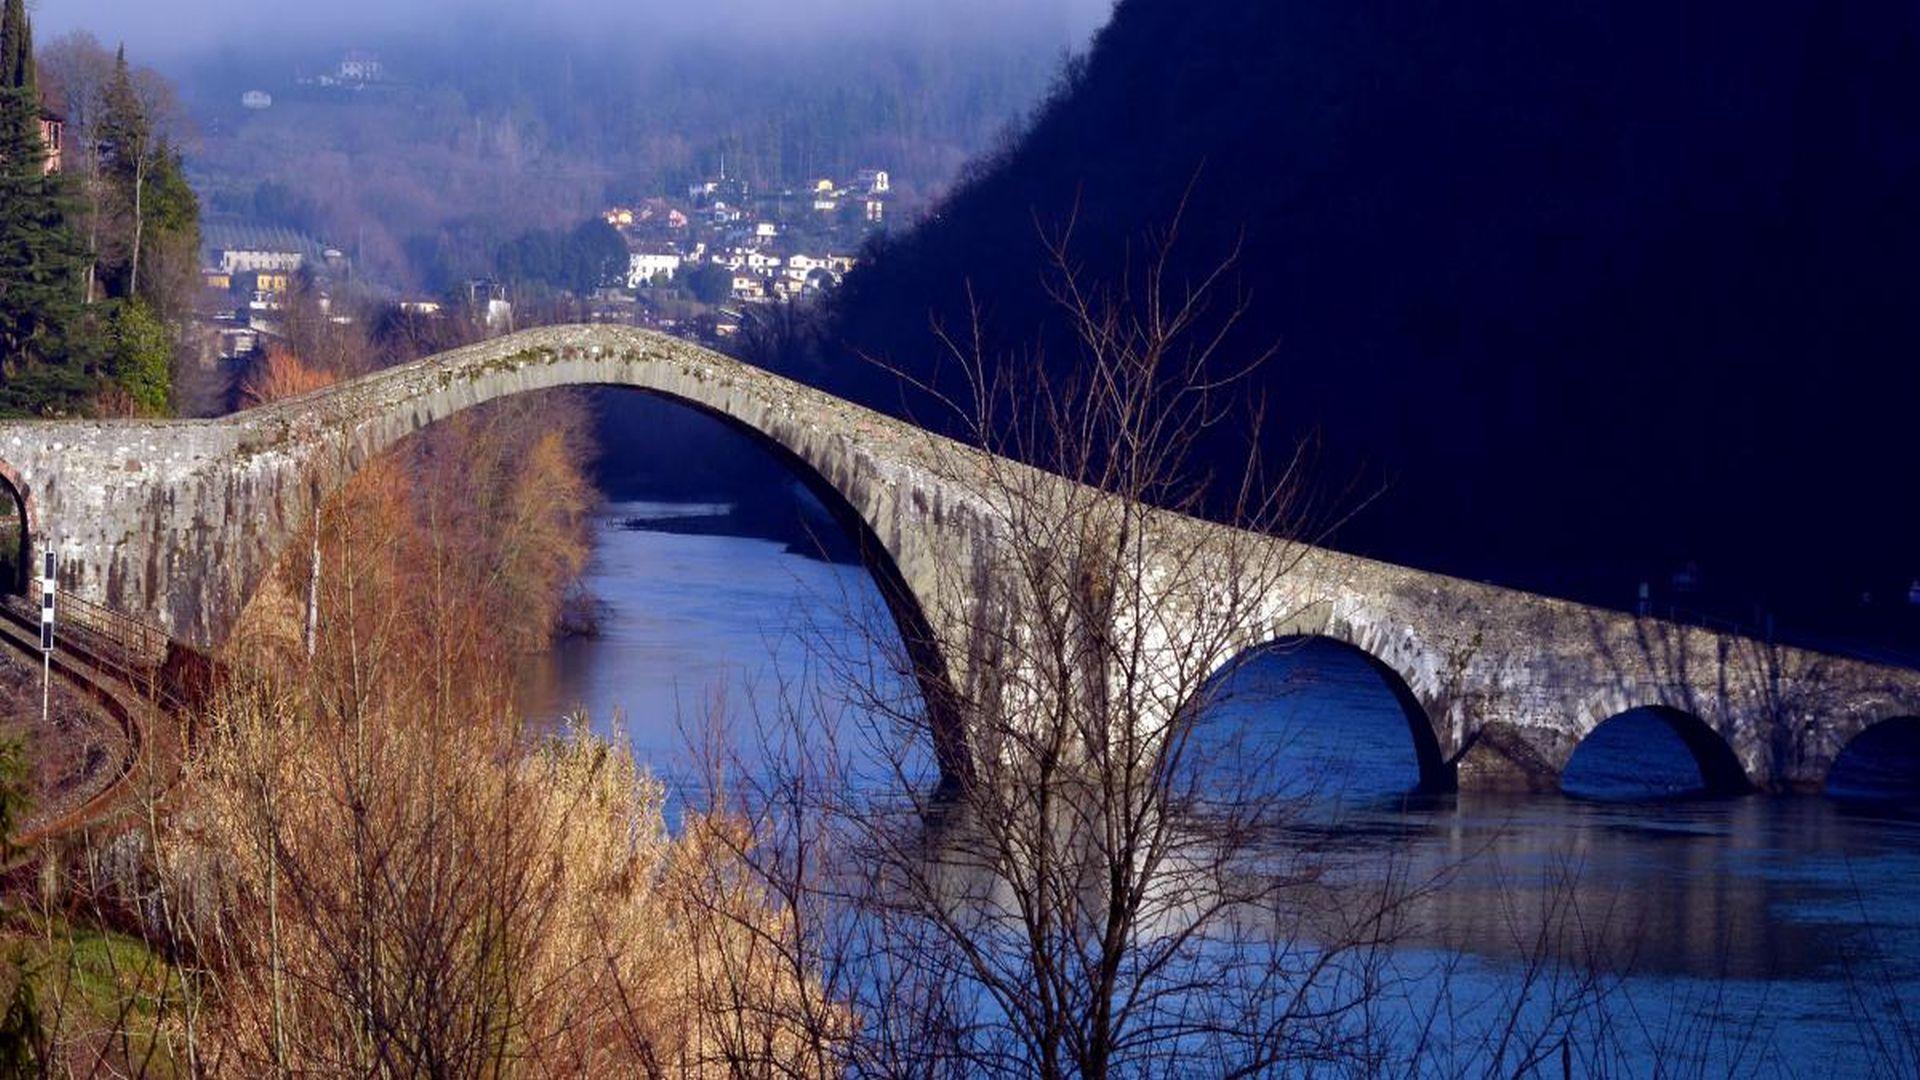 ponte del diavolo